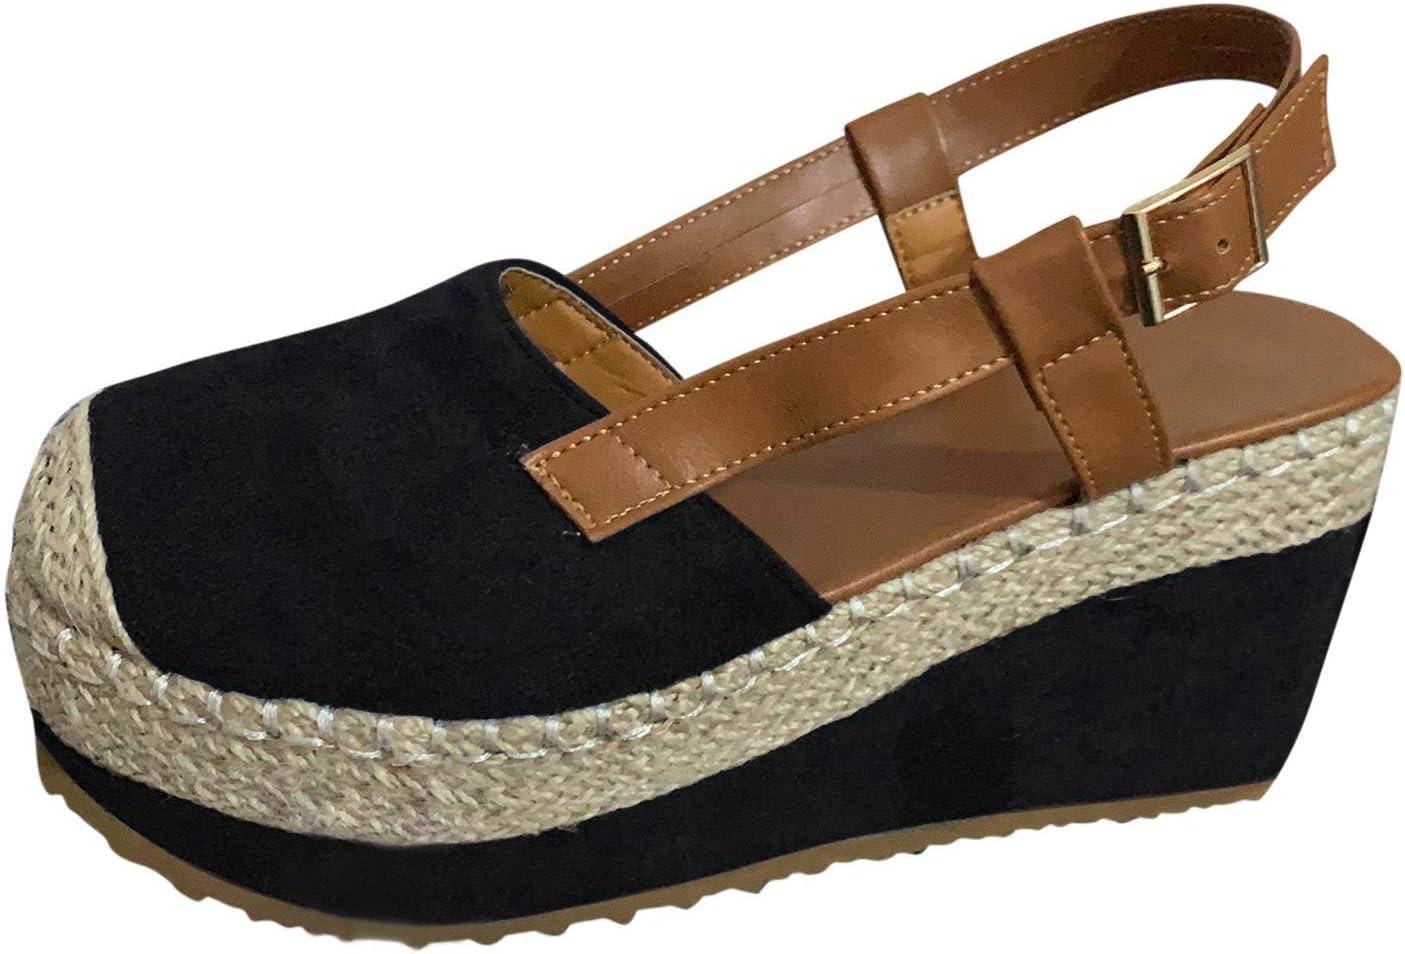 KHIIen Womens Espadrilles Wedge Sandals Closed Toe Buckle Strap